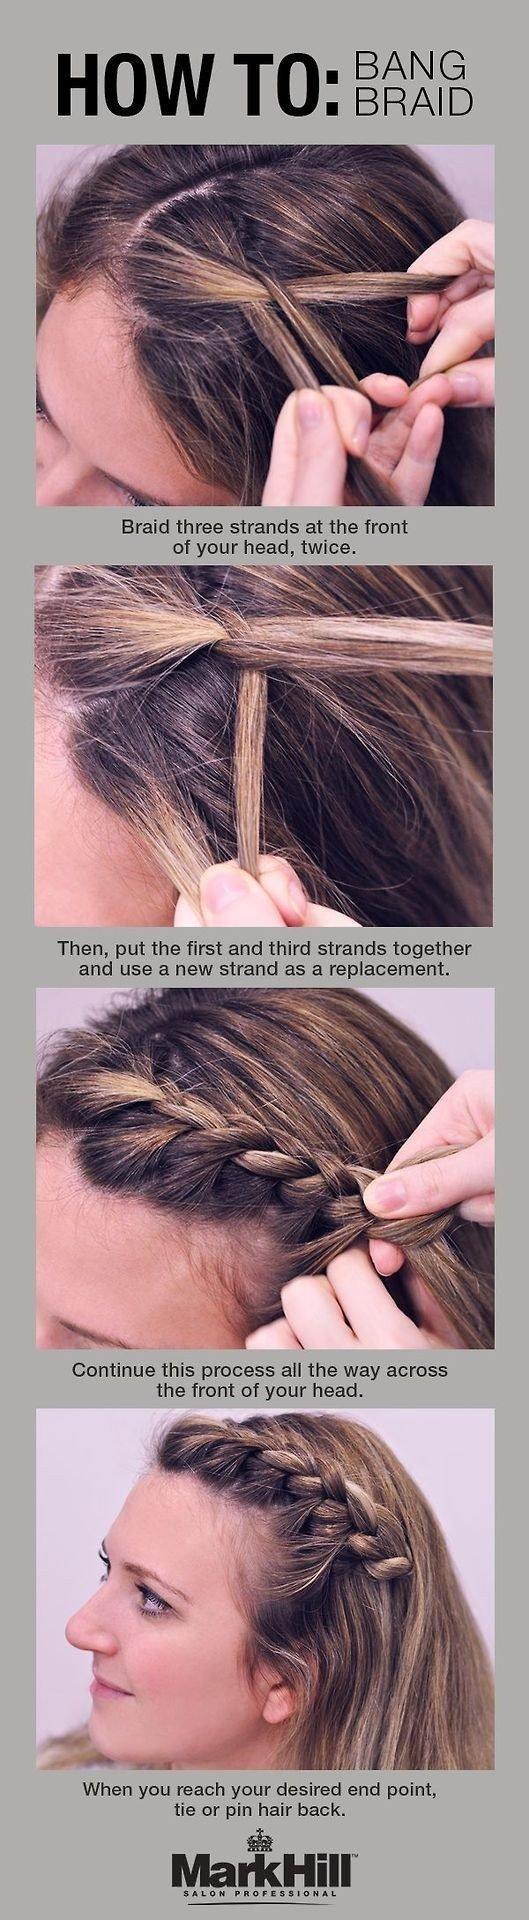 How to Braid the BIG Braid